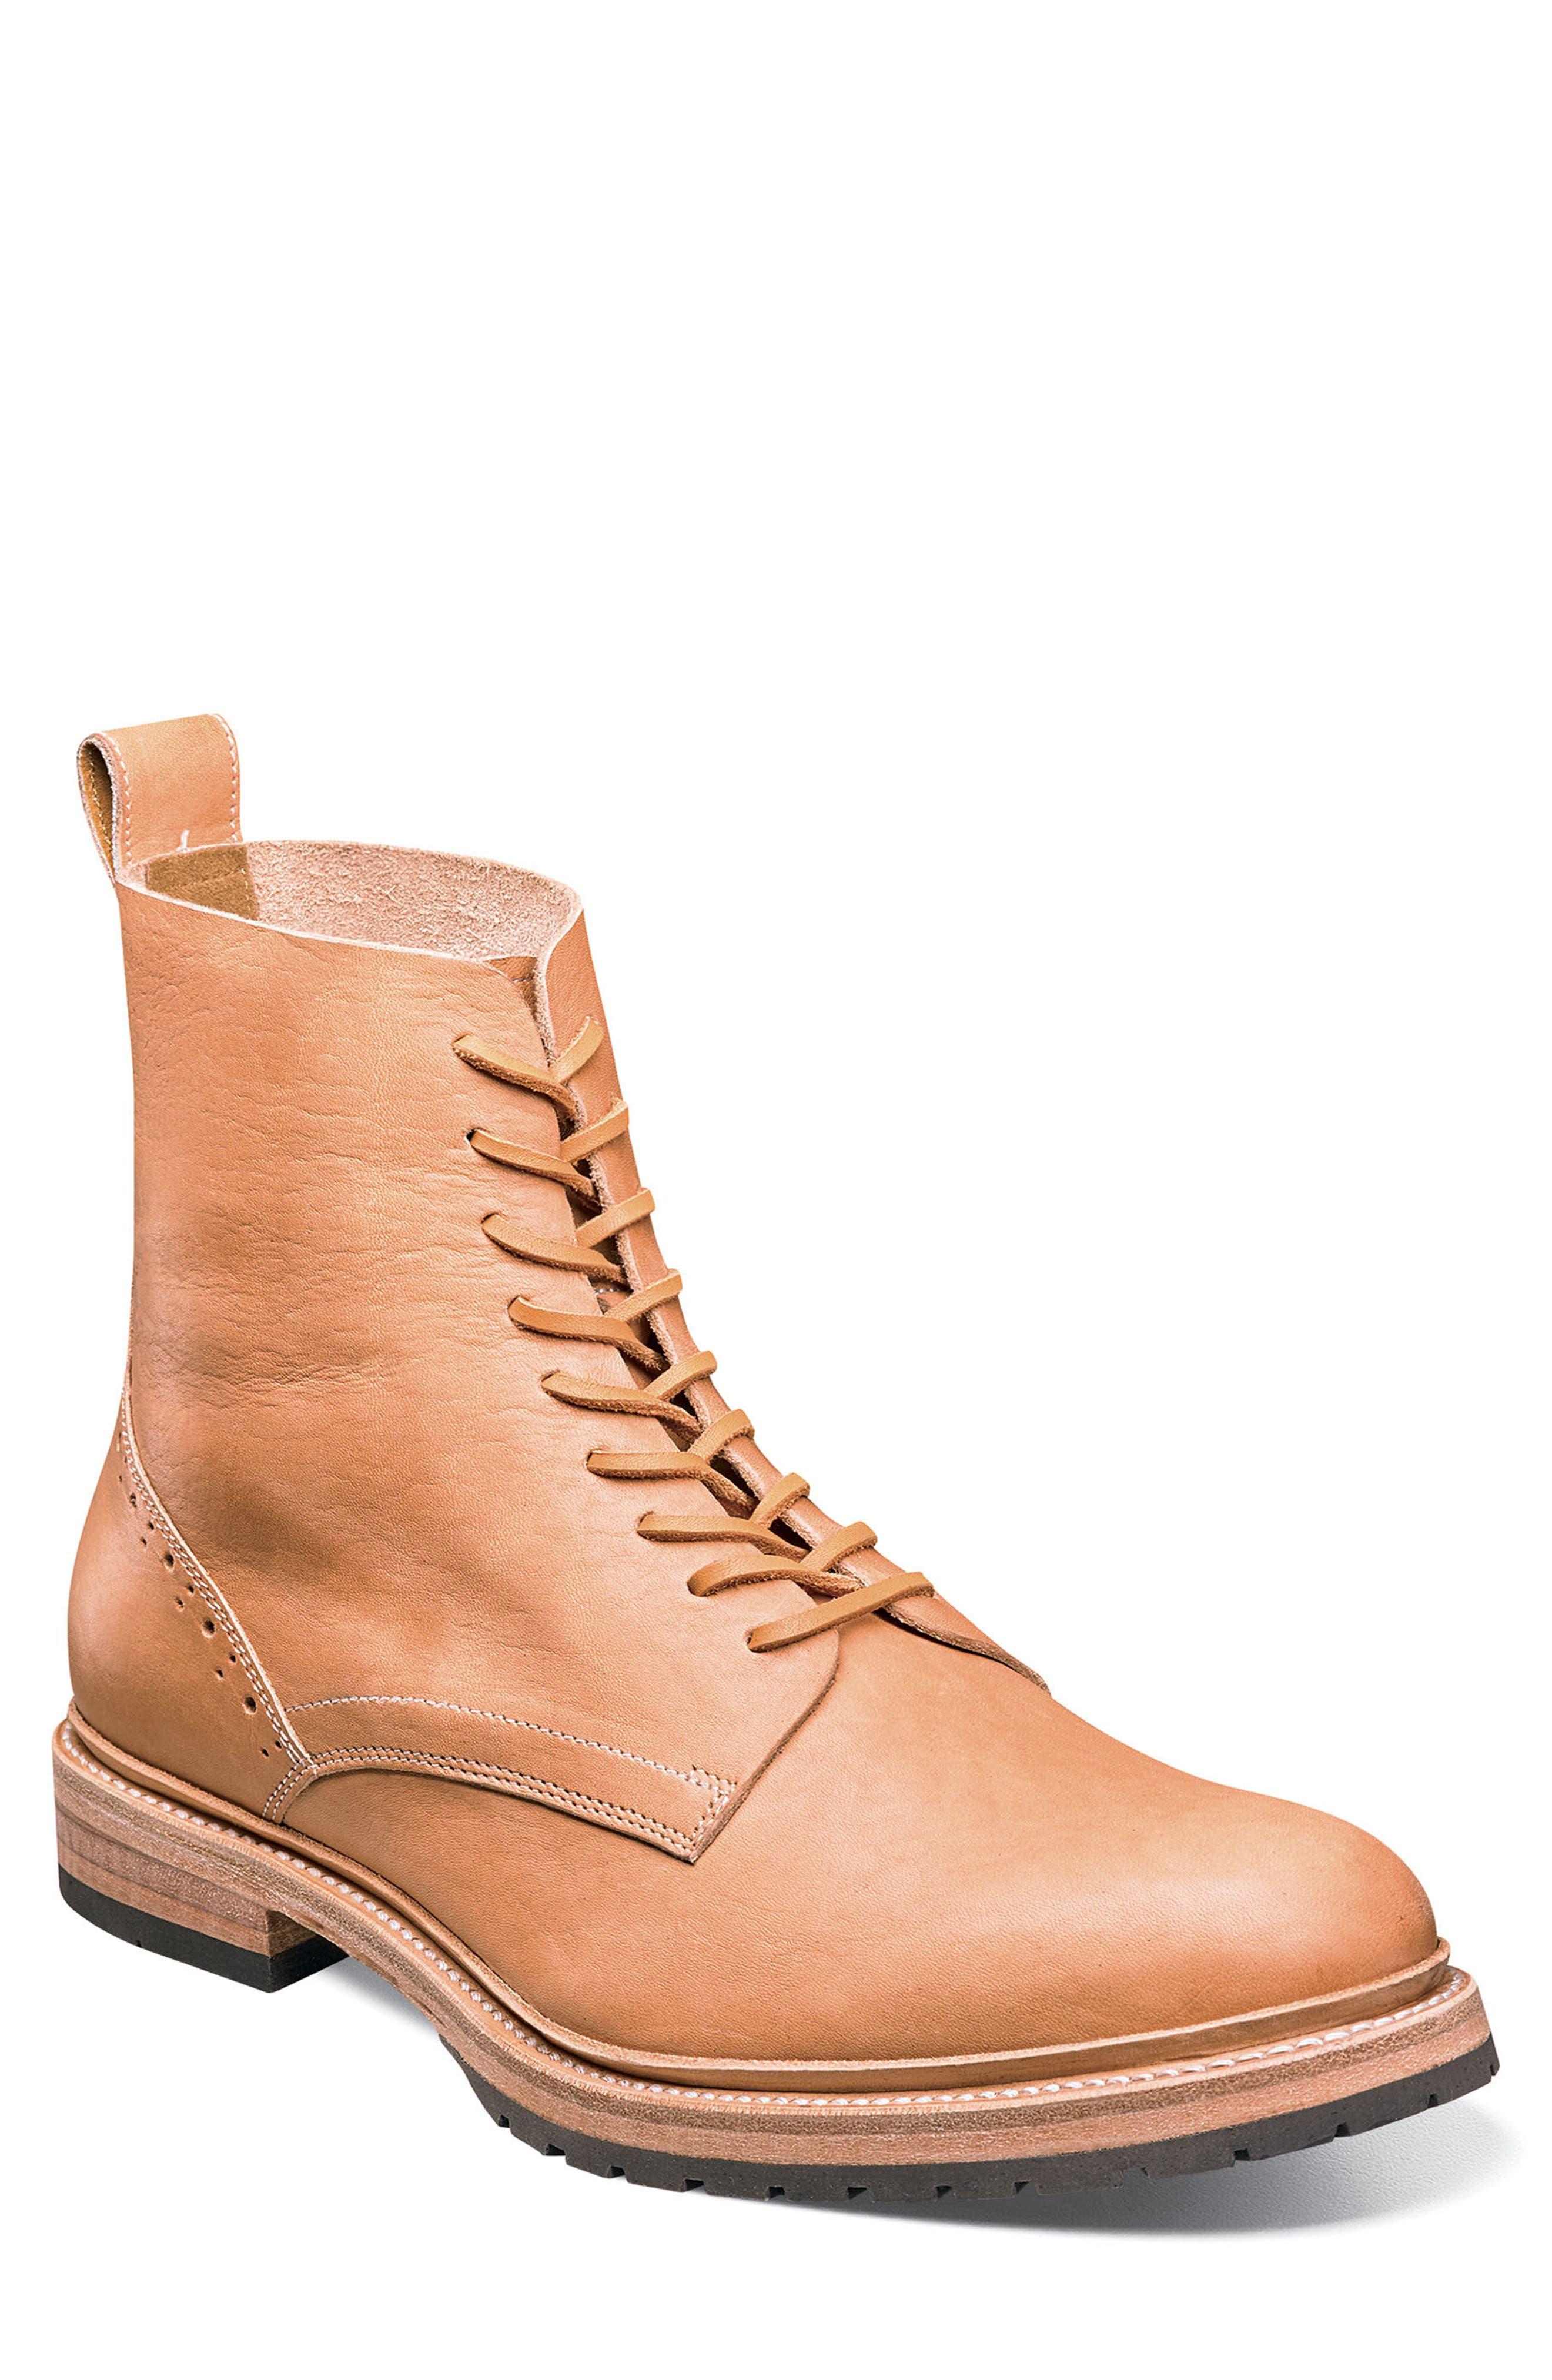 M2 Plain Toe Boot,                             Main thumbnail 1, color,                             NATURAL LEATHER